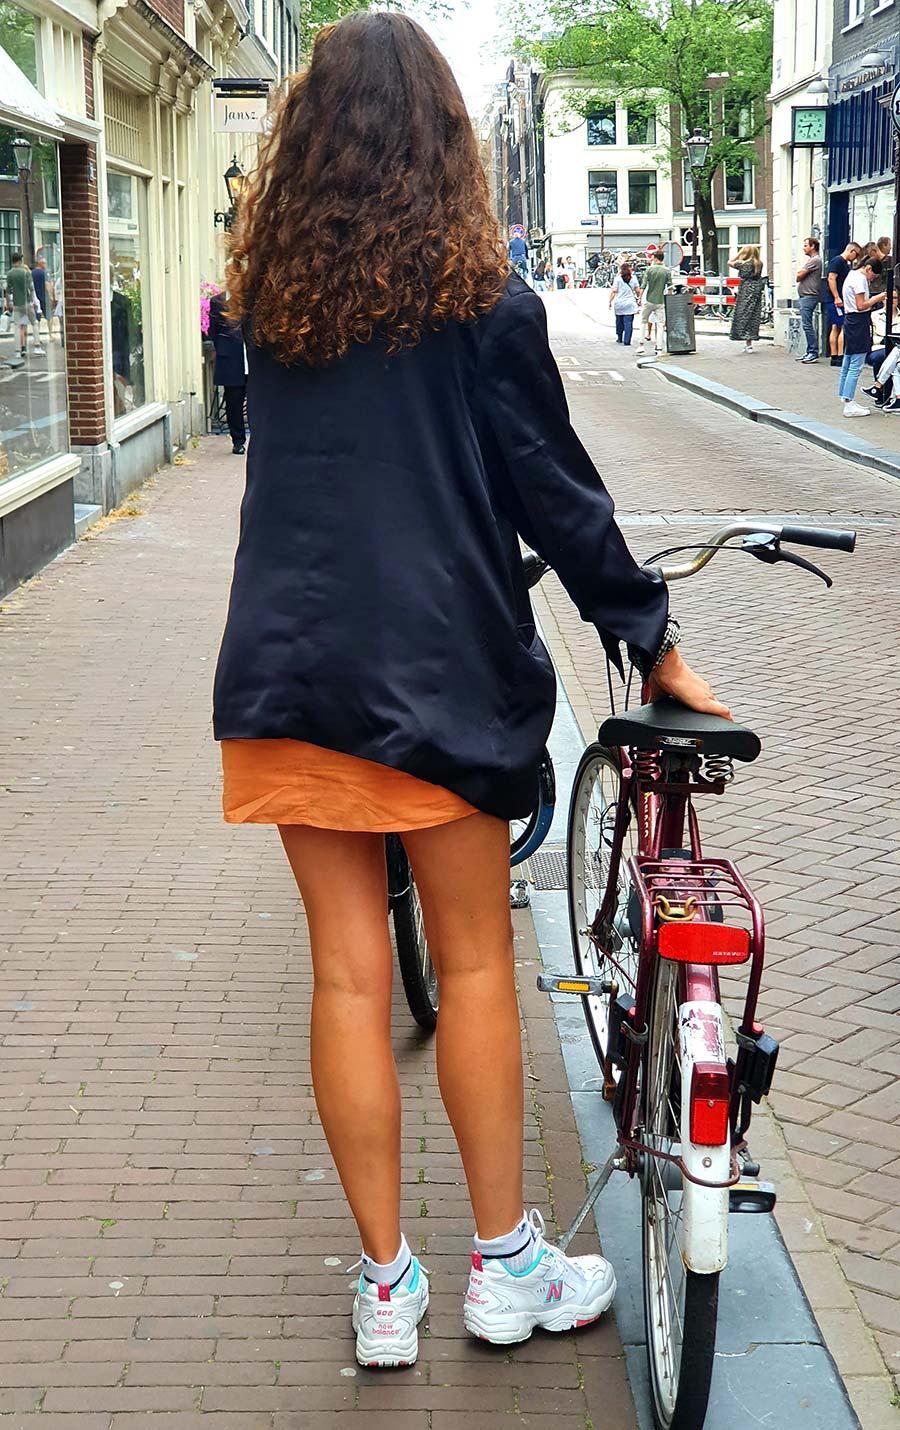 Amsterdam woman on bike